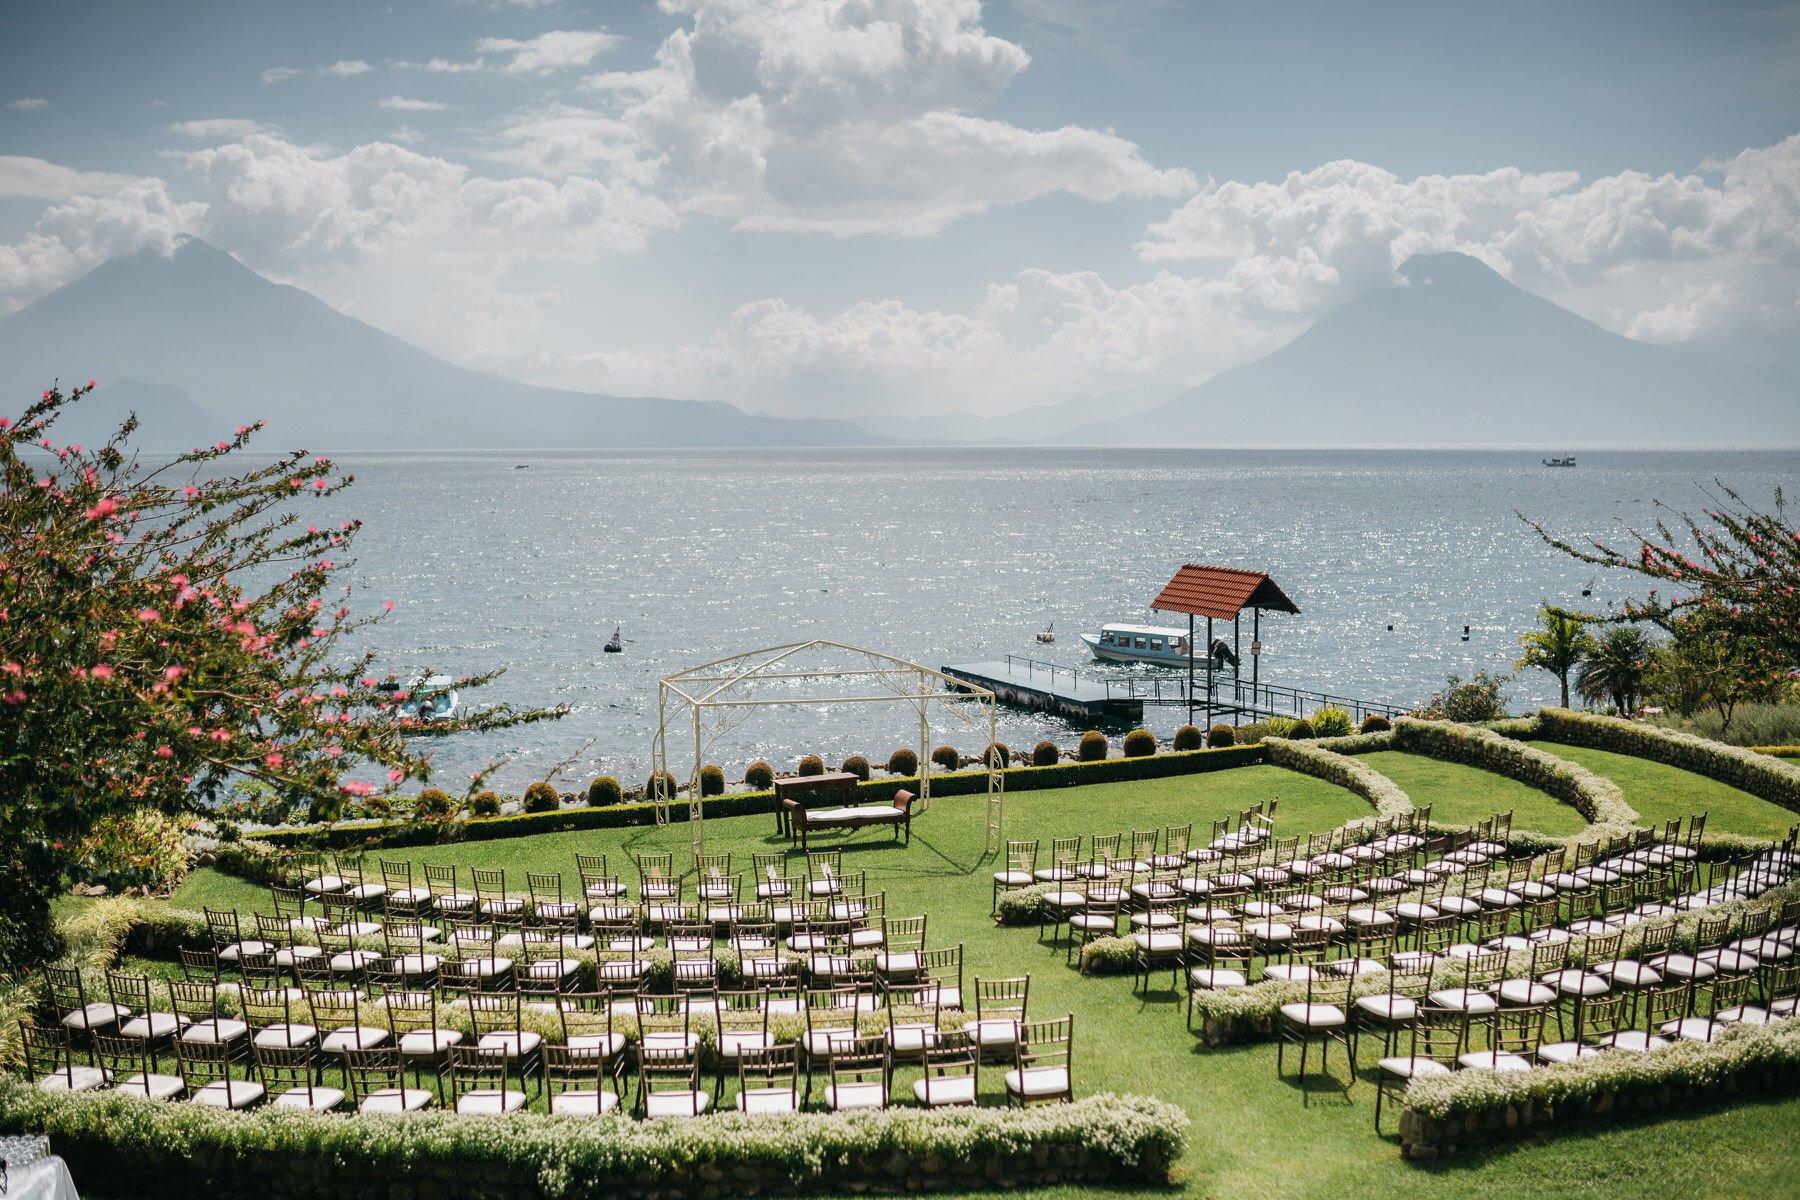 Boda Hotel Atitlan Guatemala